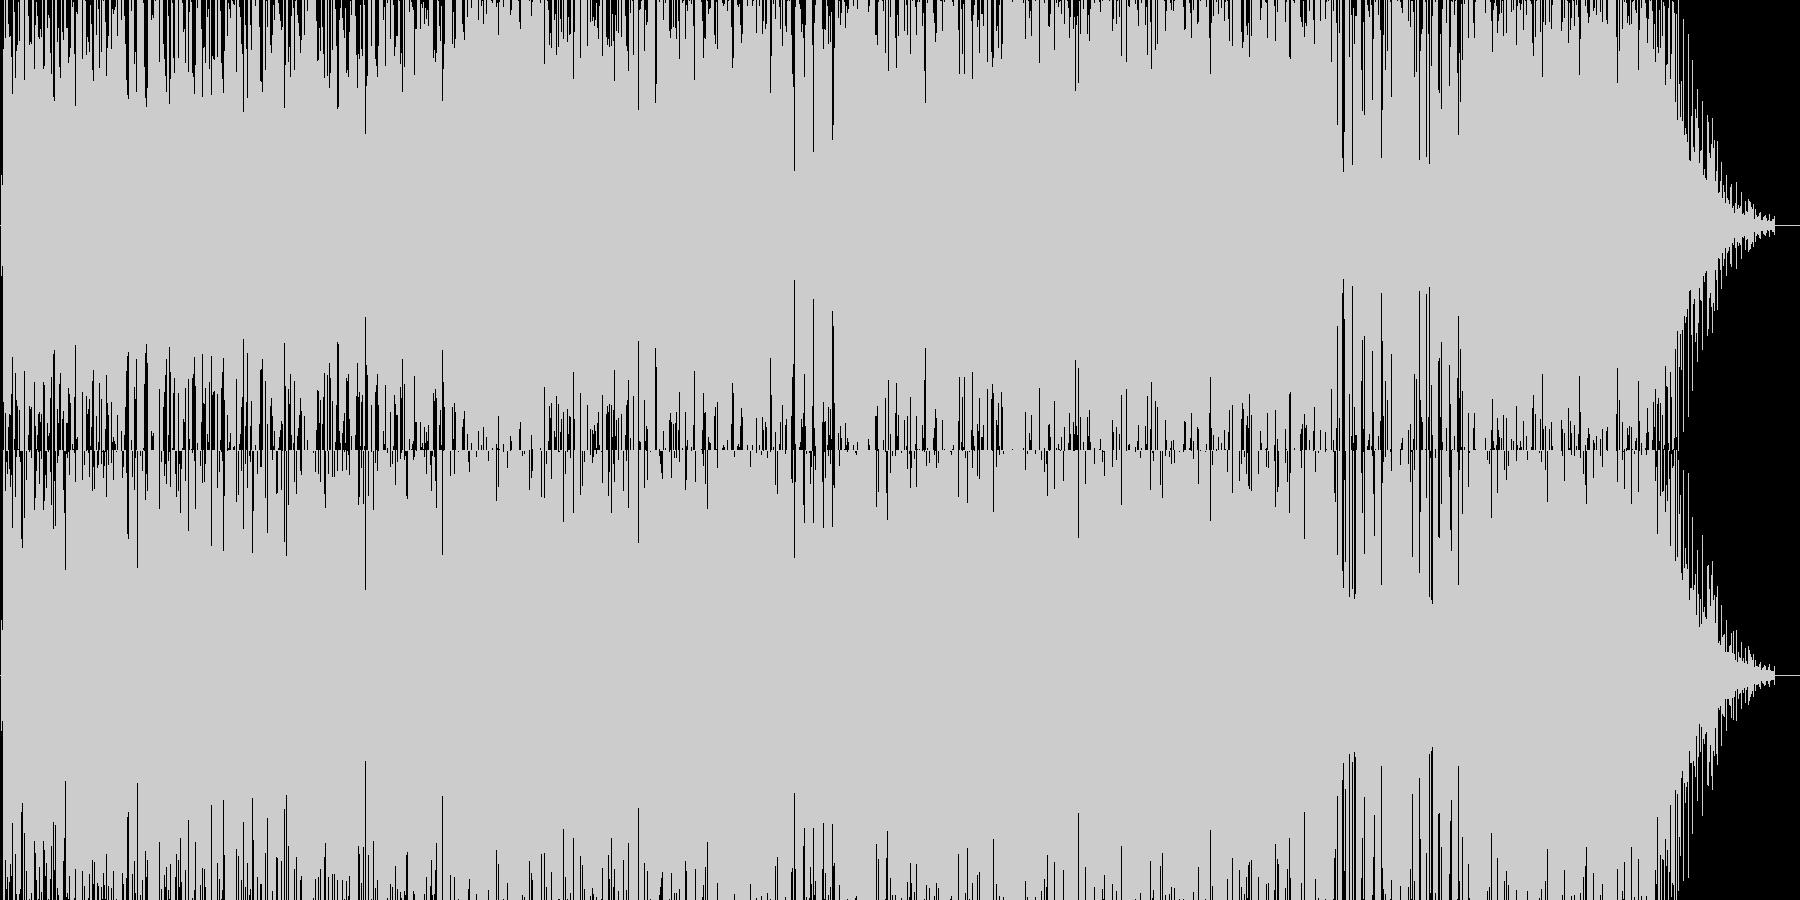 R&B風のJ-popバラードの未再生の波形